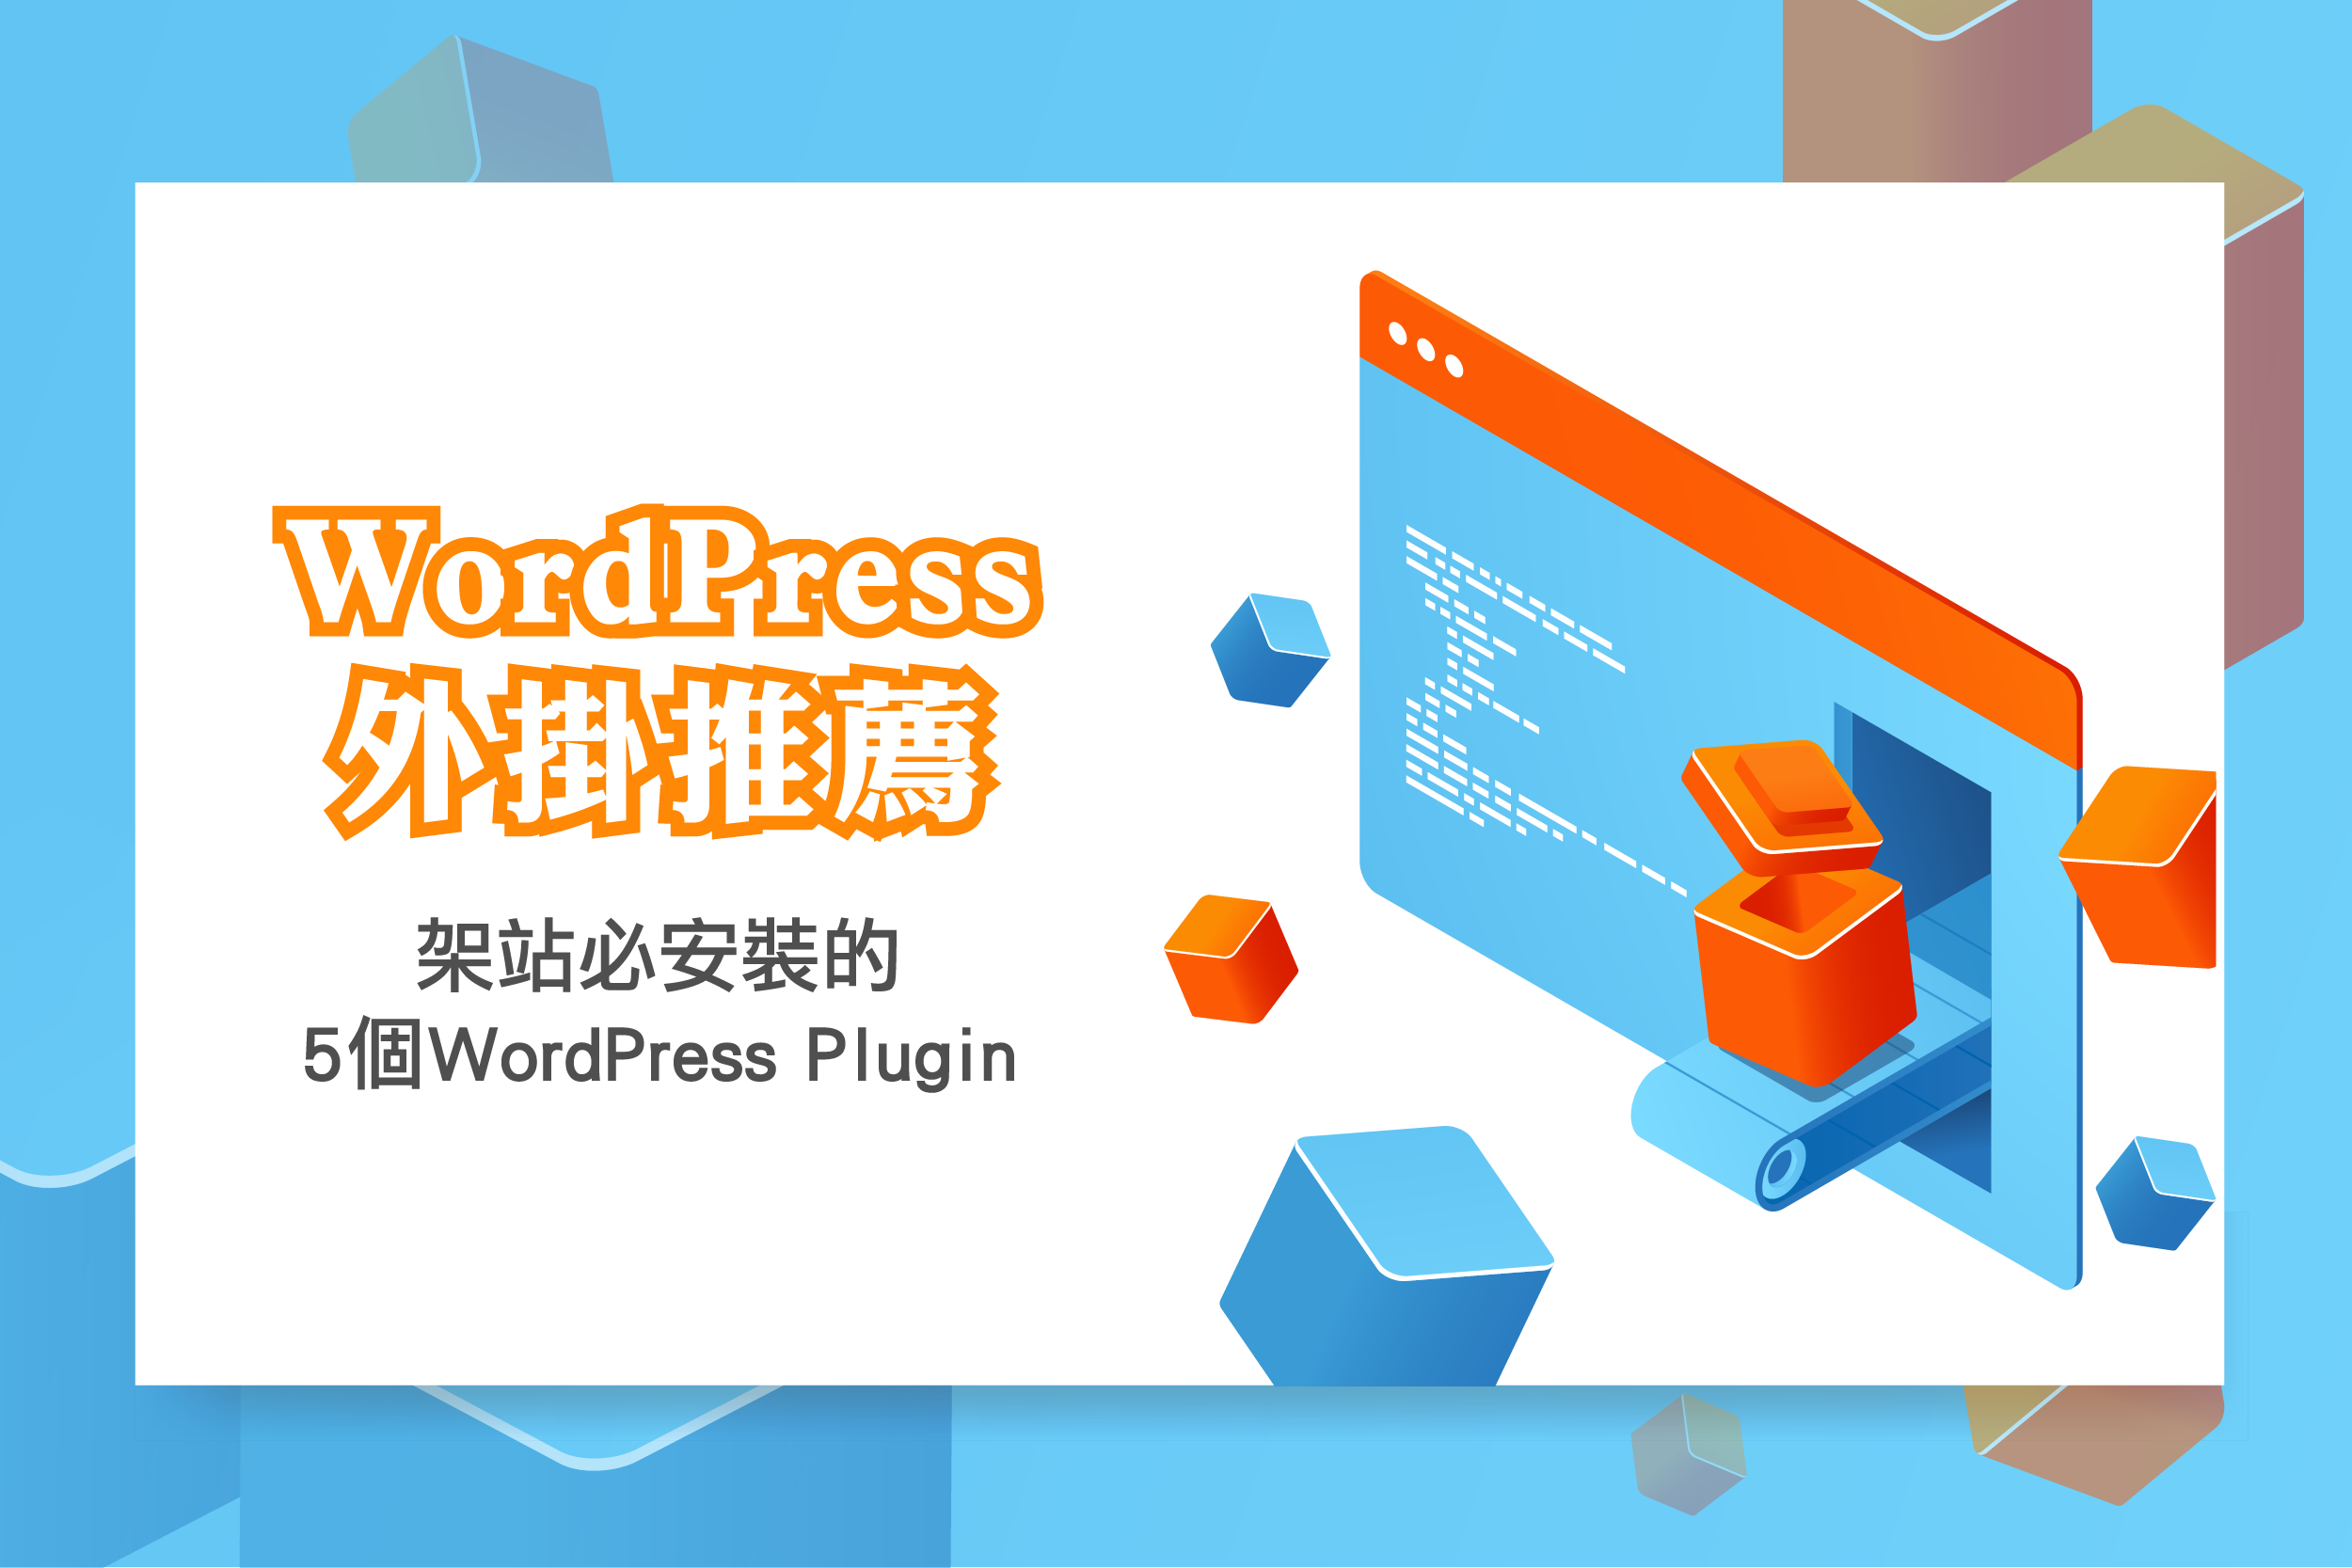 【WordPress教學】WordPress外掛推薦,架站必安裝的5個WordPress Plugin